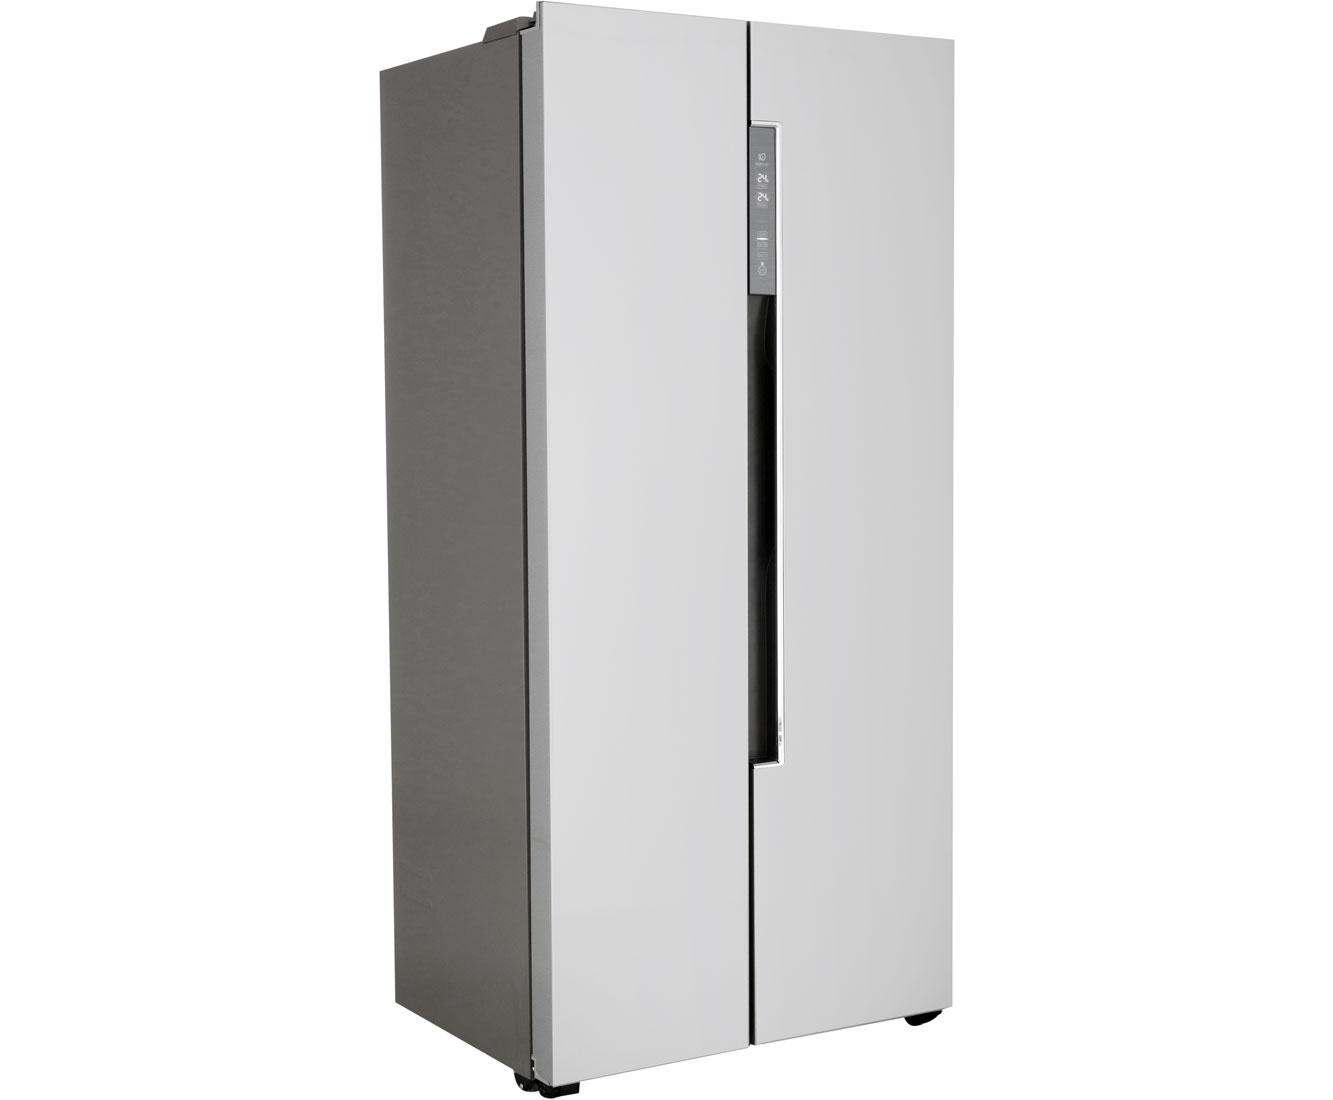 Platzbedarf Amerikanischer Kühlschrank : Platzbedarf amerikanischer kühlschrank side by side kühlschrank